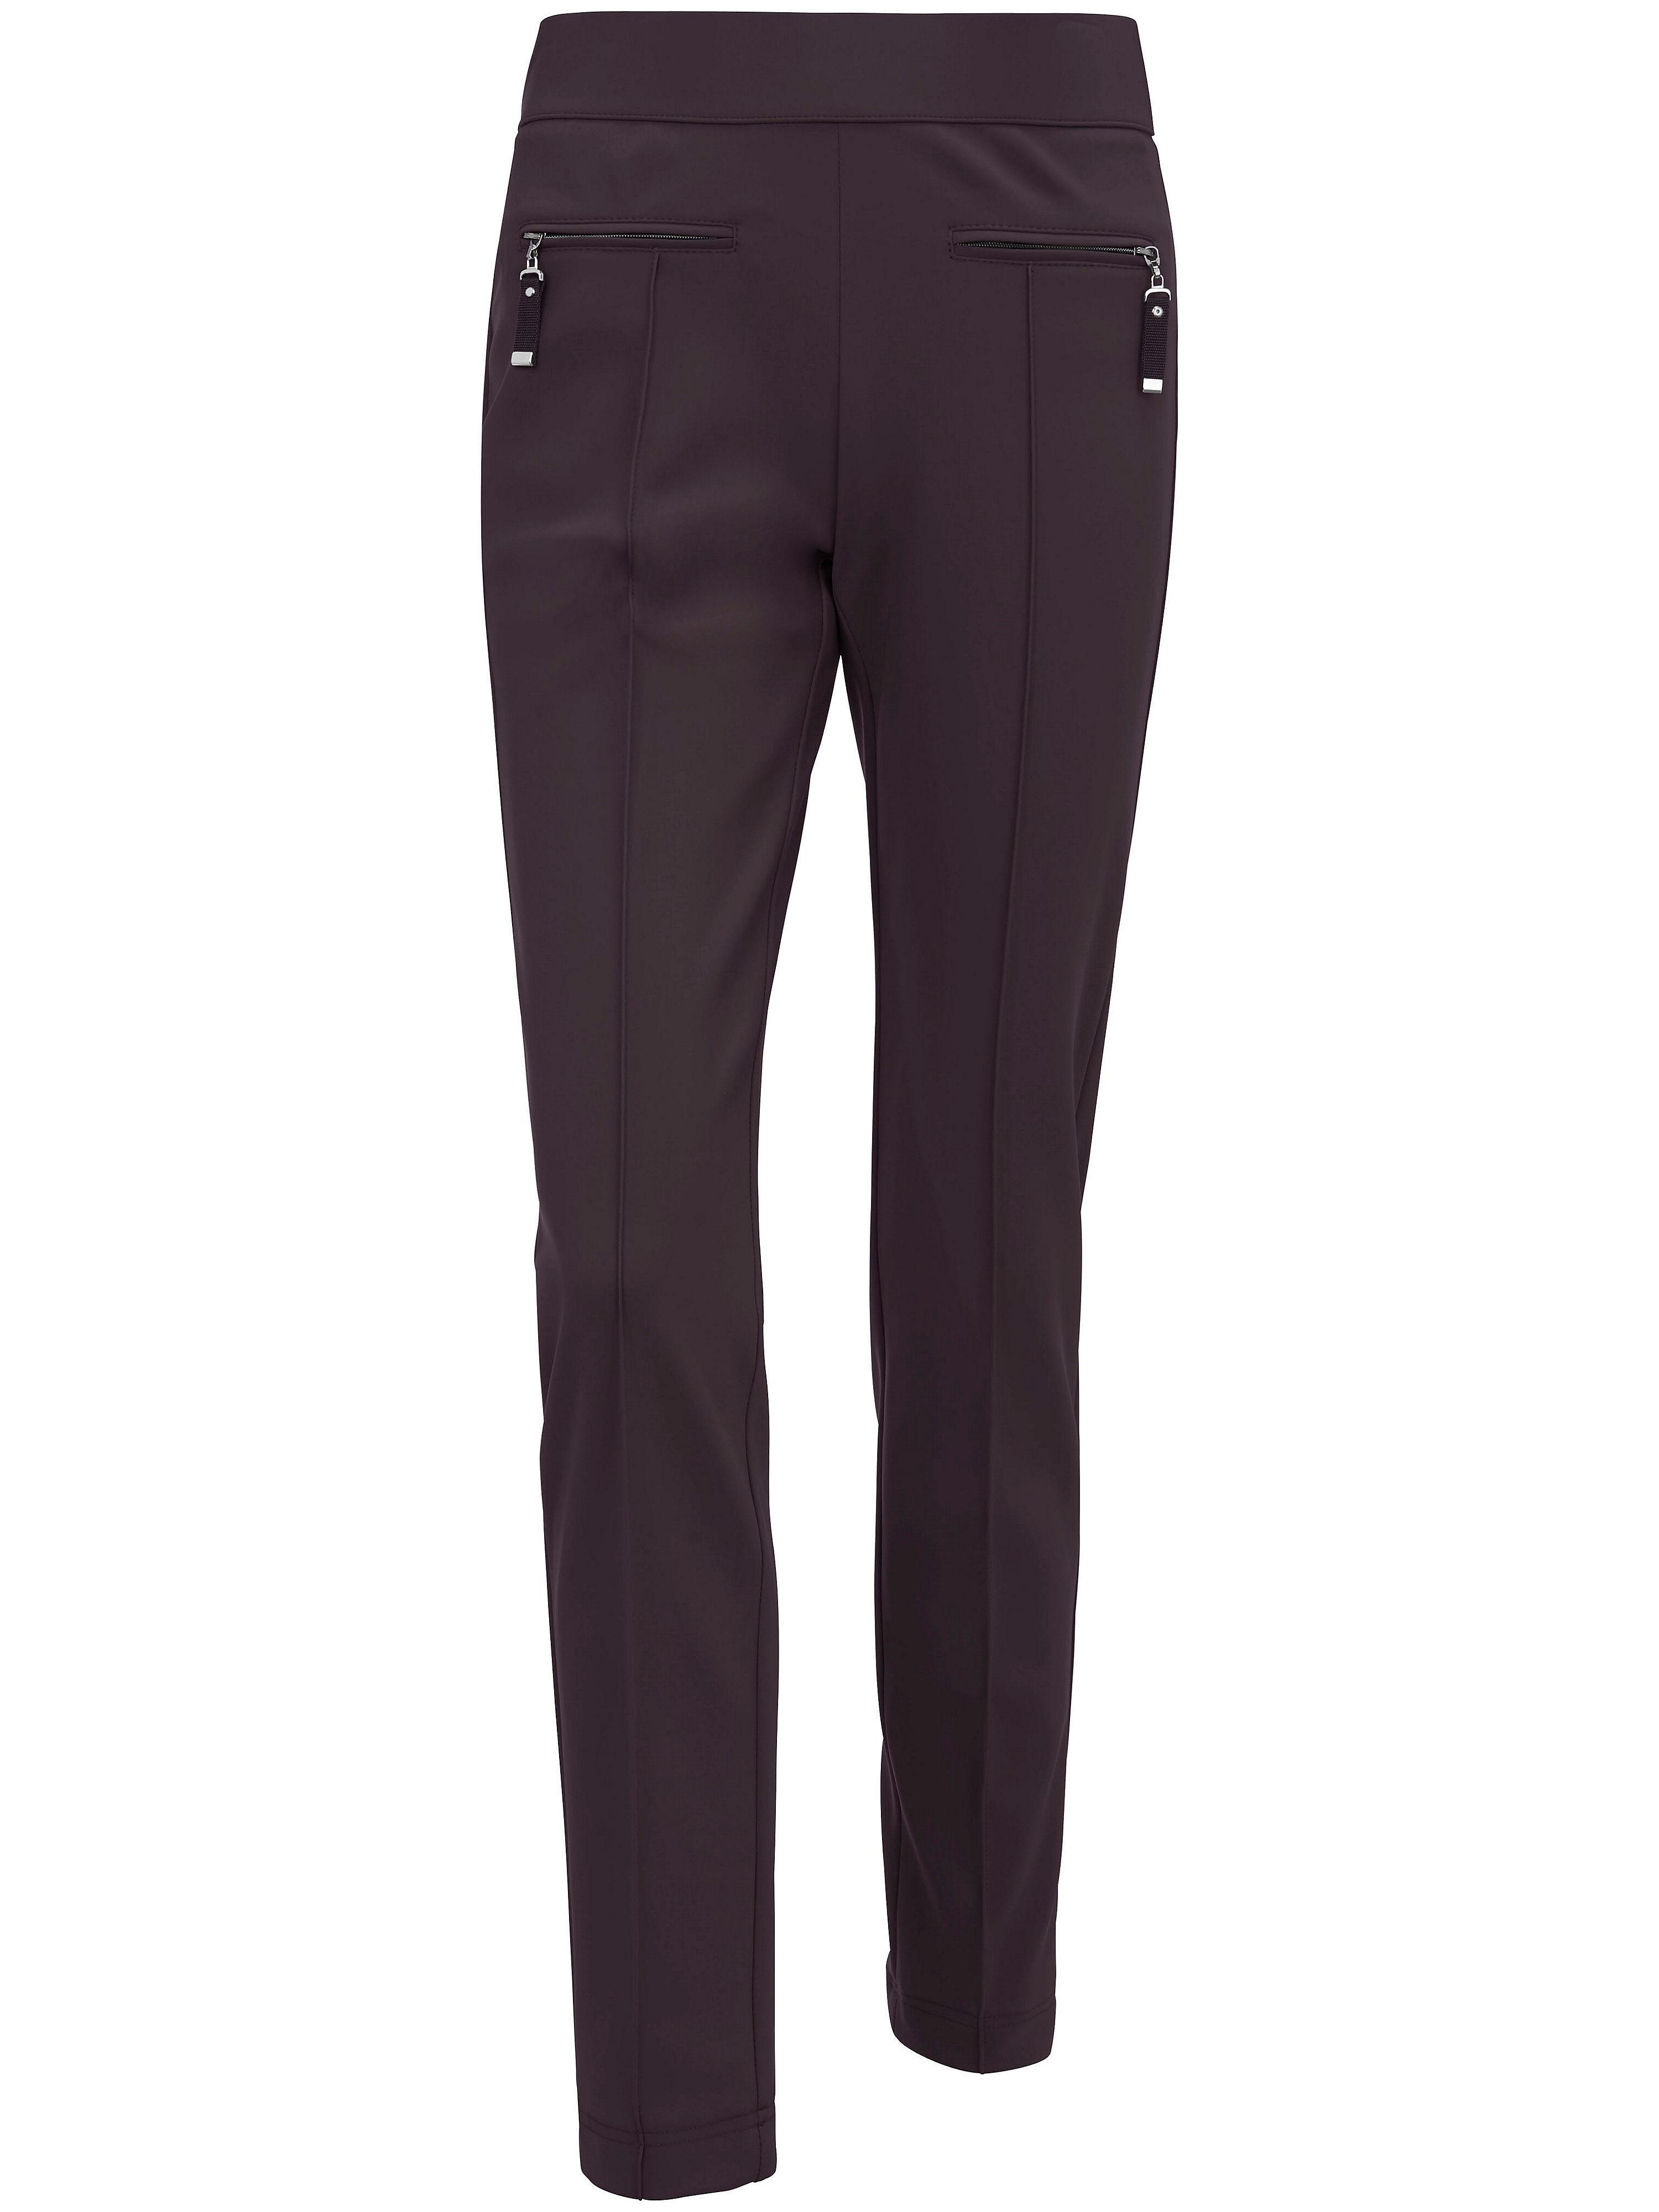 Le pantalon slim en jersey modèle OTTI  Raffaello Rossi rouge